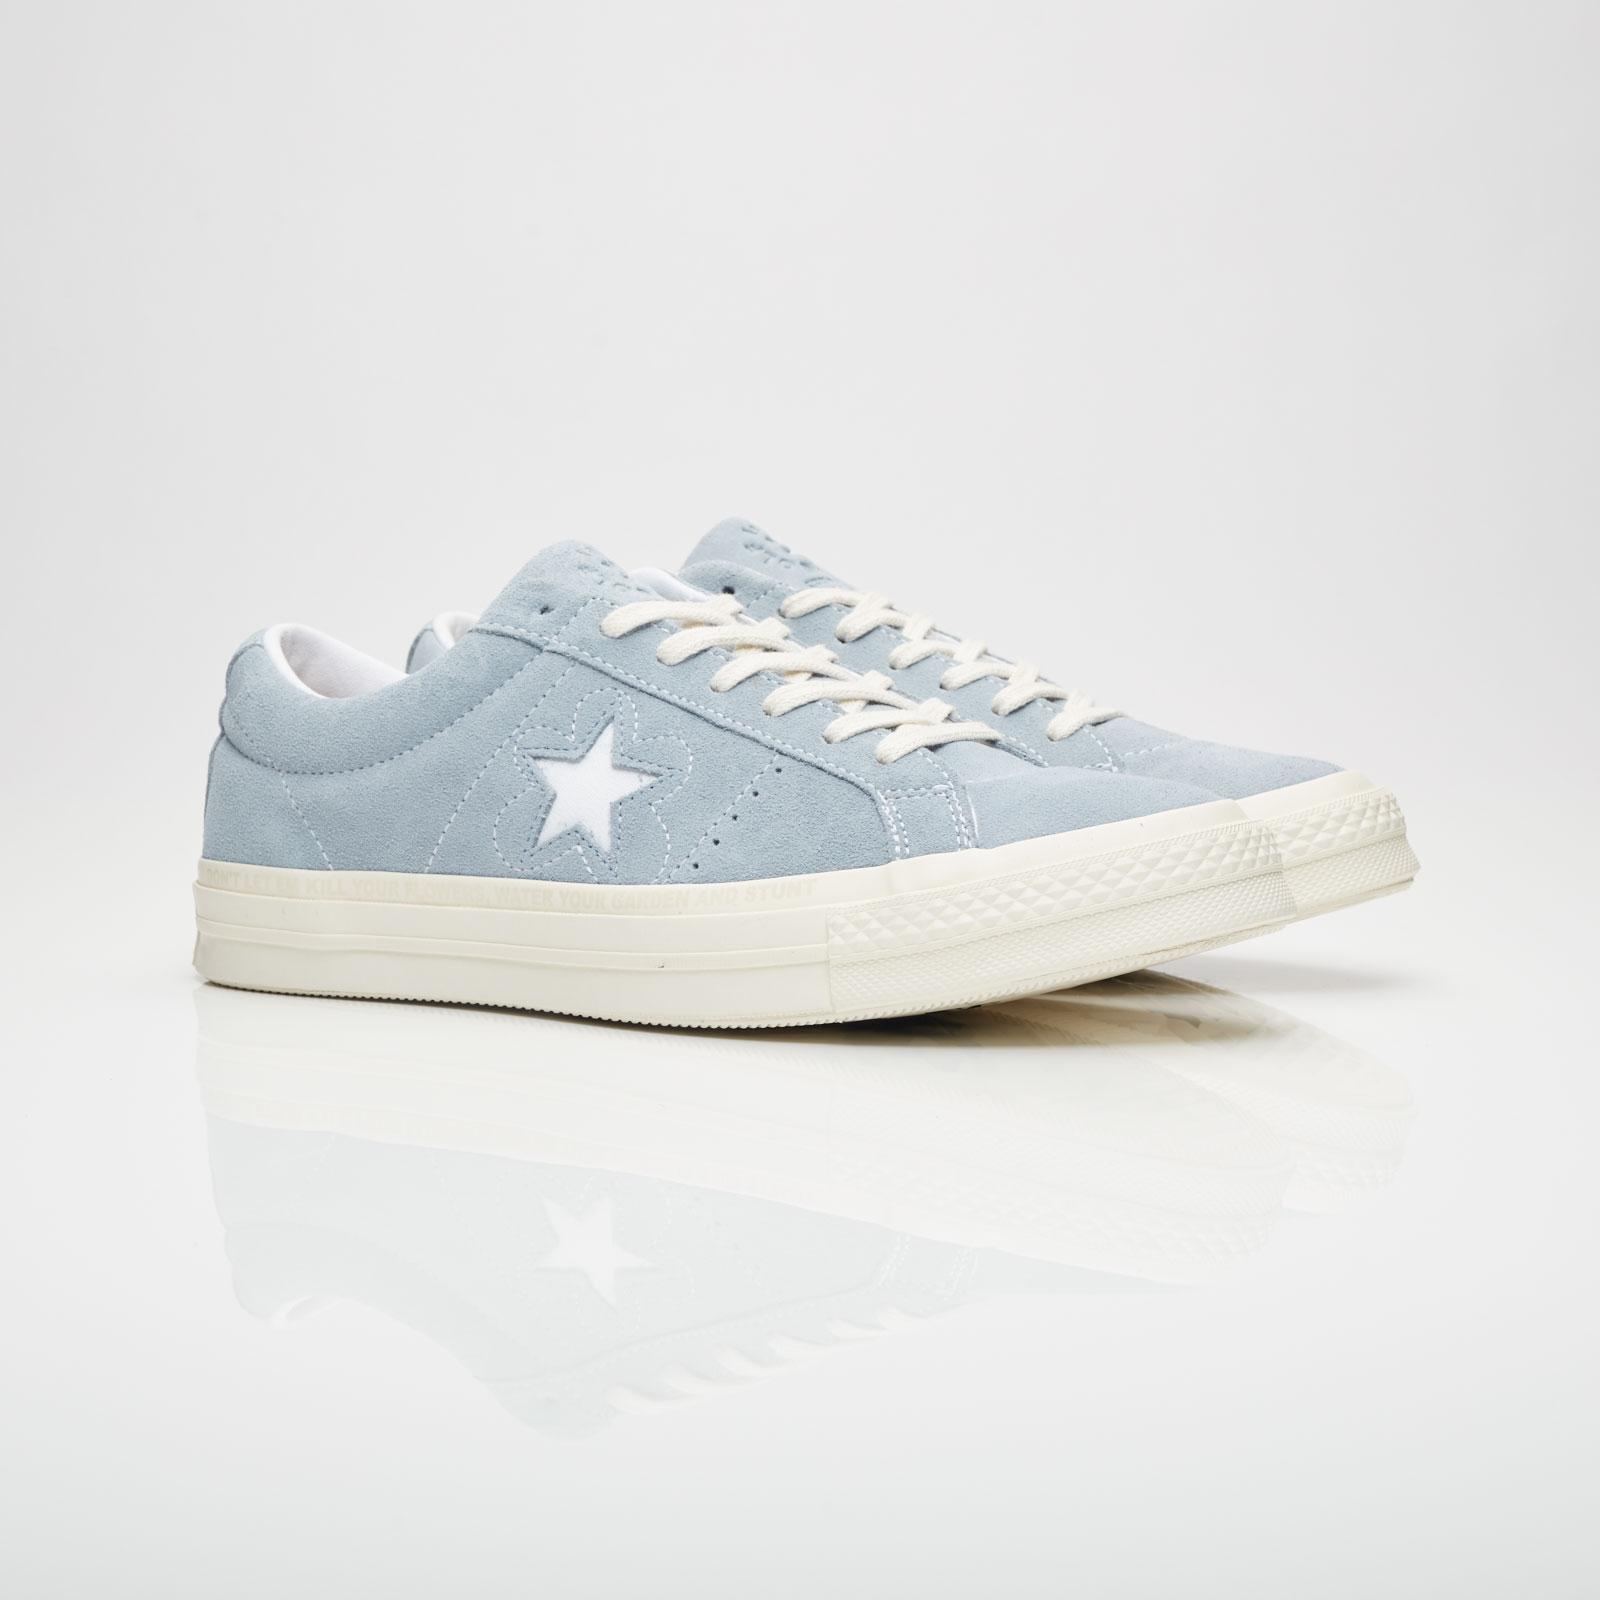 Converse One Star x Golf le Fleur - 159432c - Sneakersnstuff ... 685130847